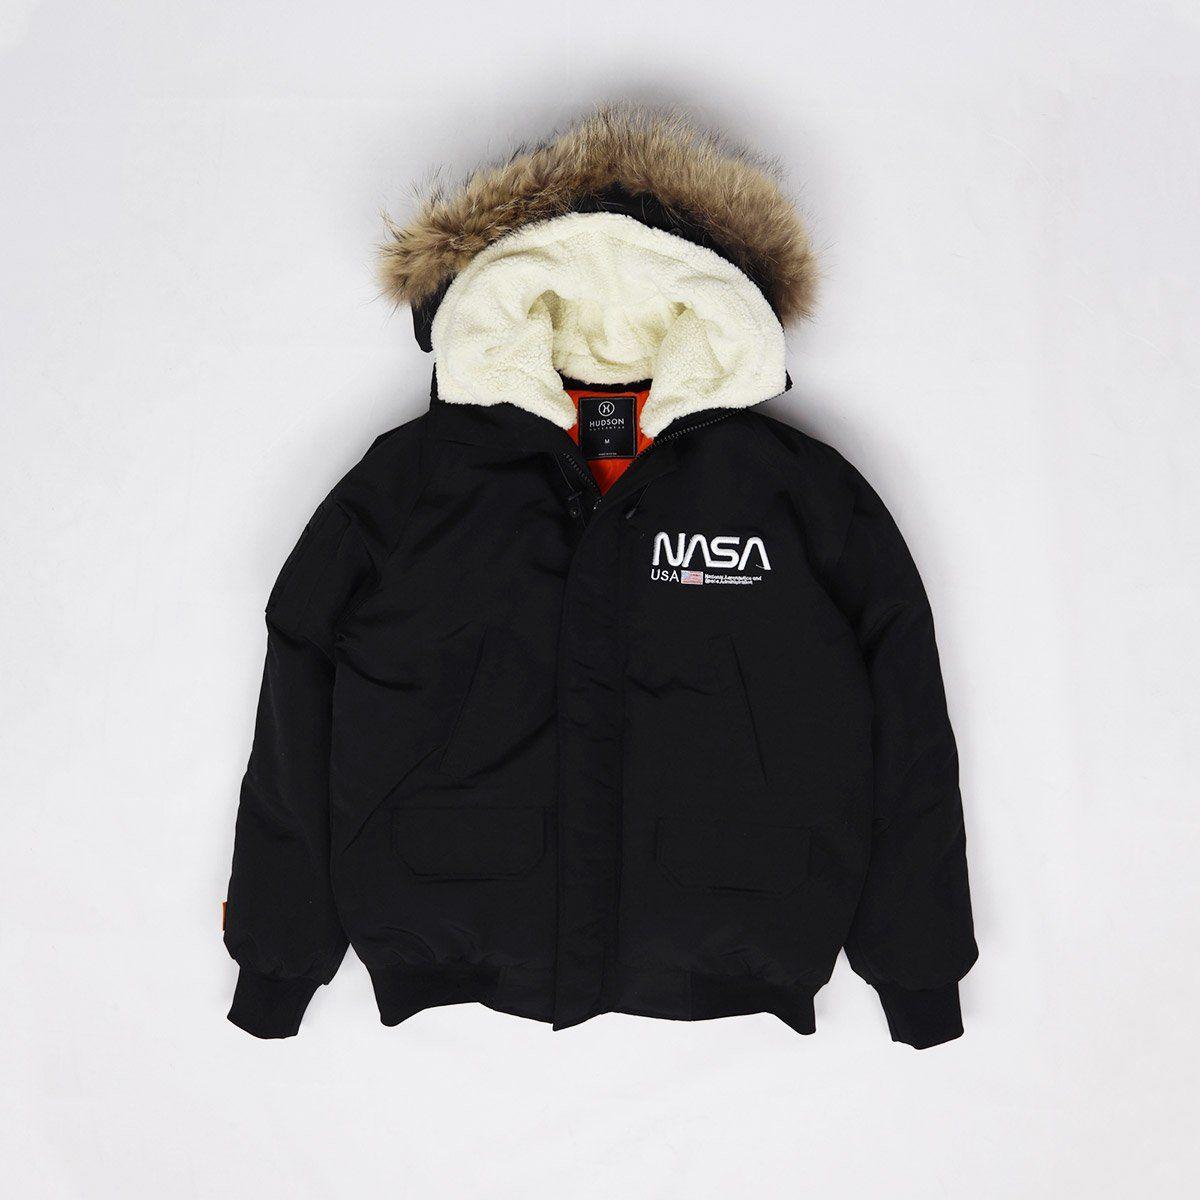 Hudson Outerwear Men S Nasa Fur Hood Bomber Jacket Bomber Jacket Fashion Black Bomber Jacket Urban Jacket [ 1200 x 1200 Pixel ]